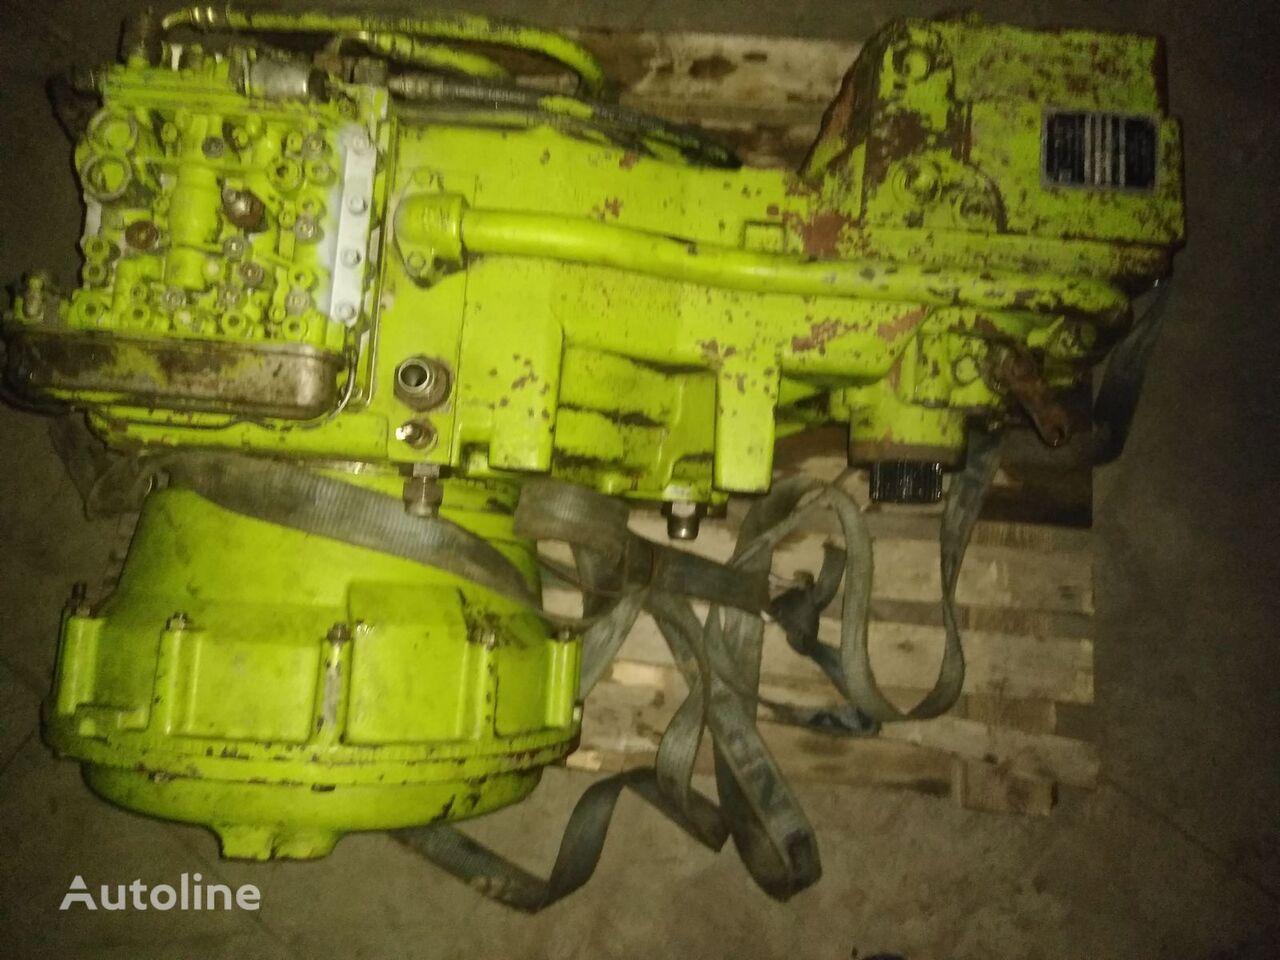 ZF 6WG 200 gearbox for LIEBHERR mobile crane